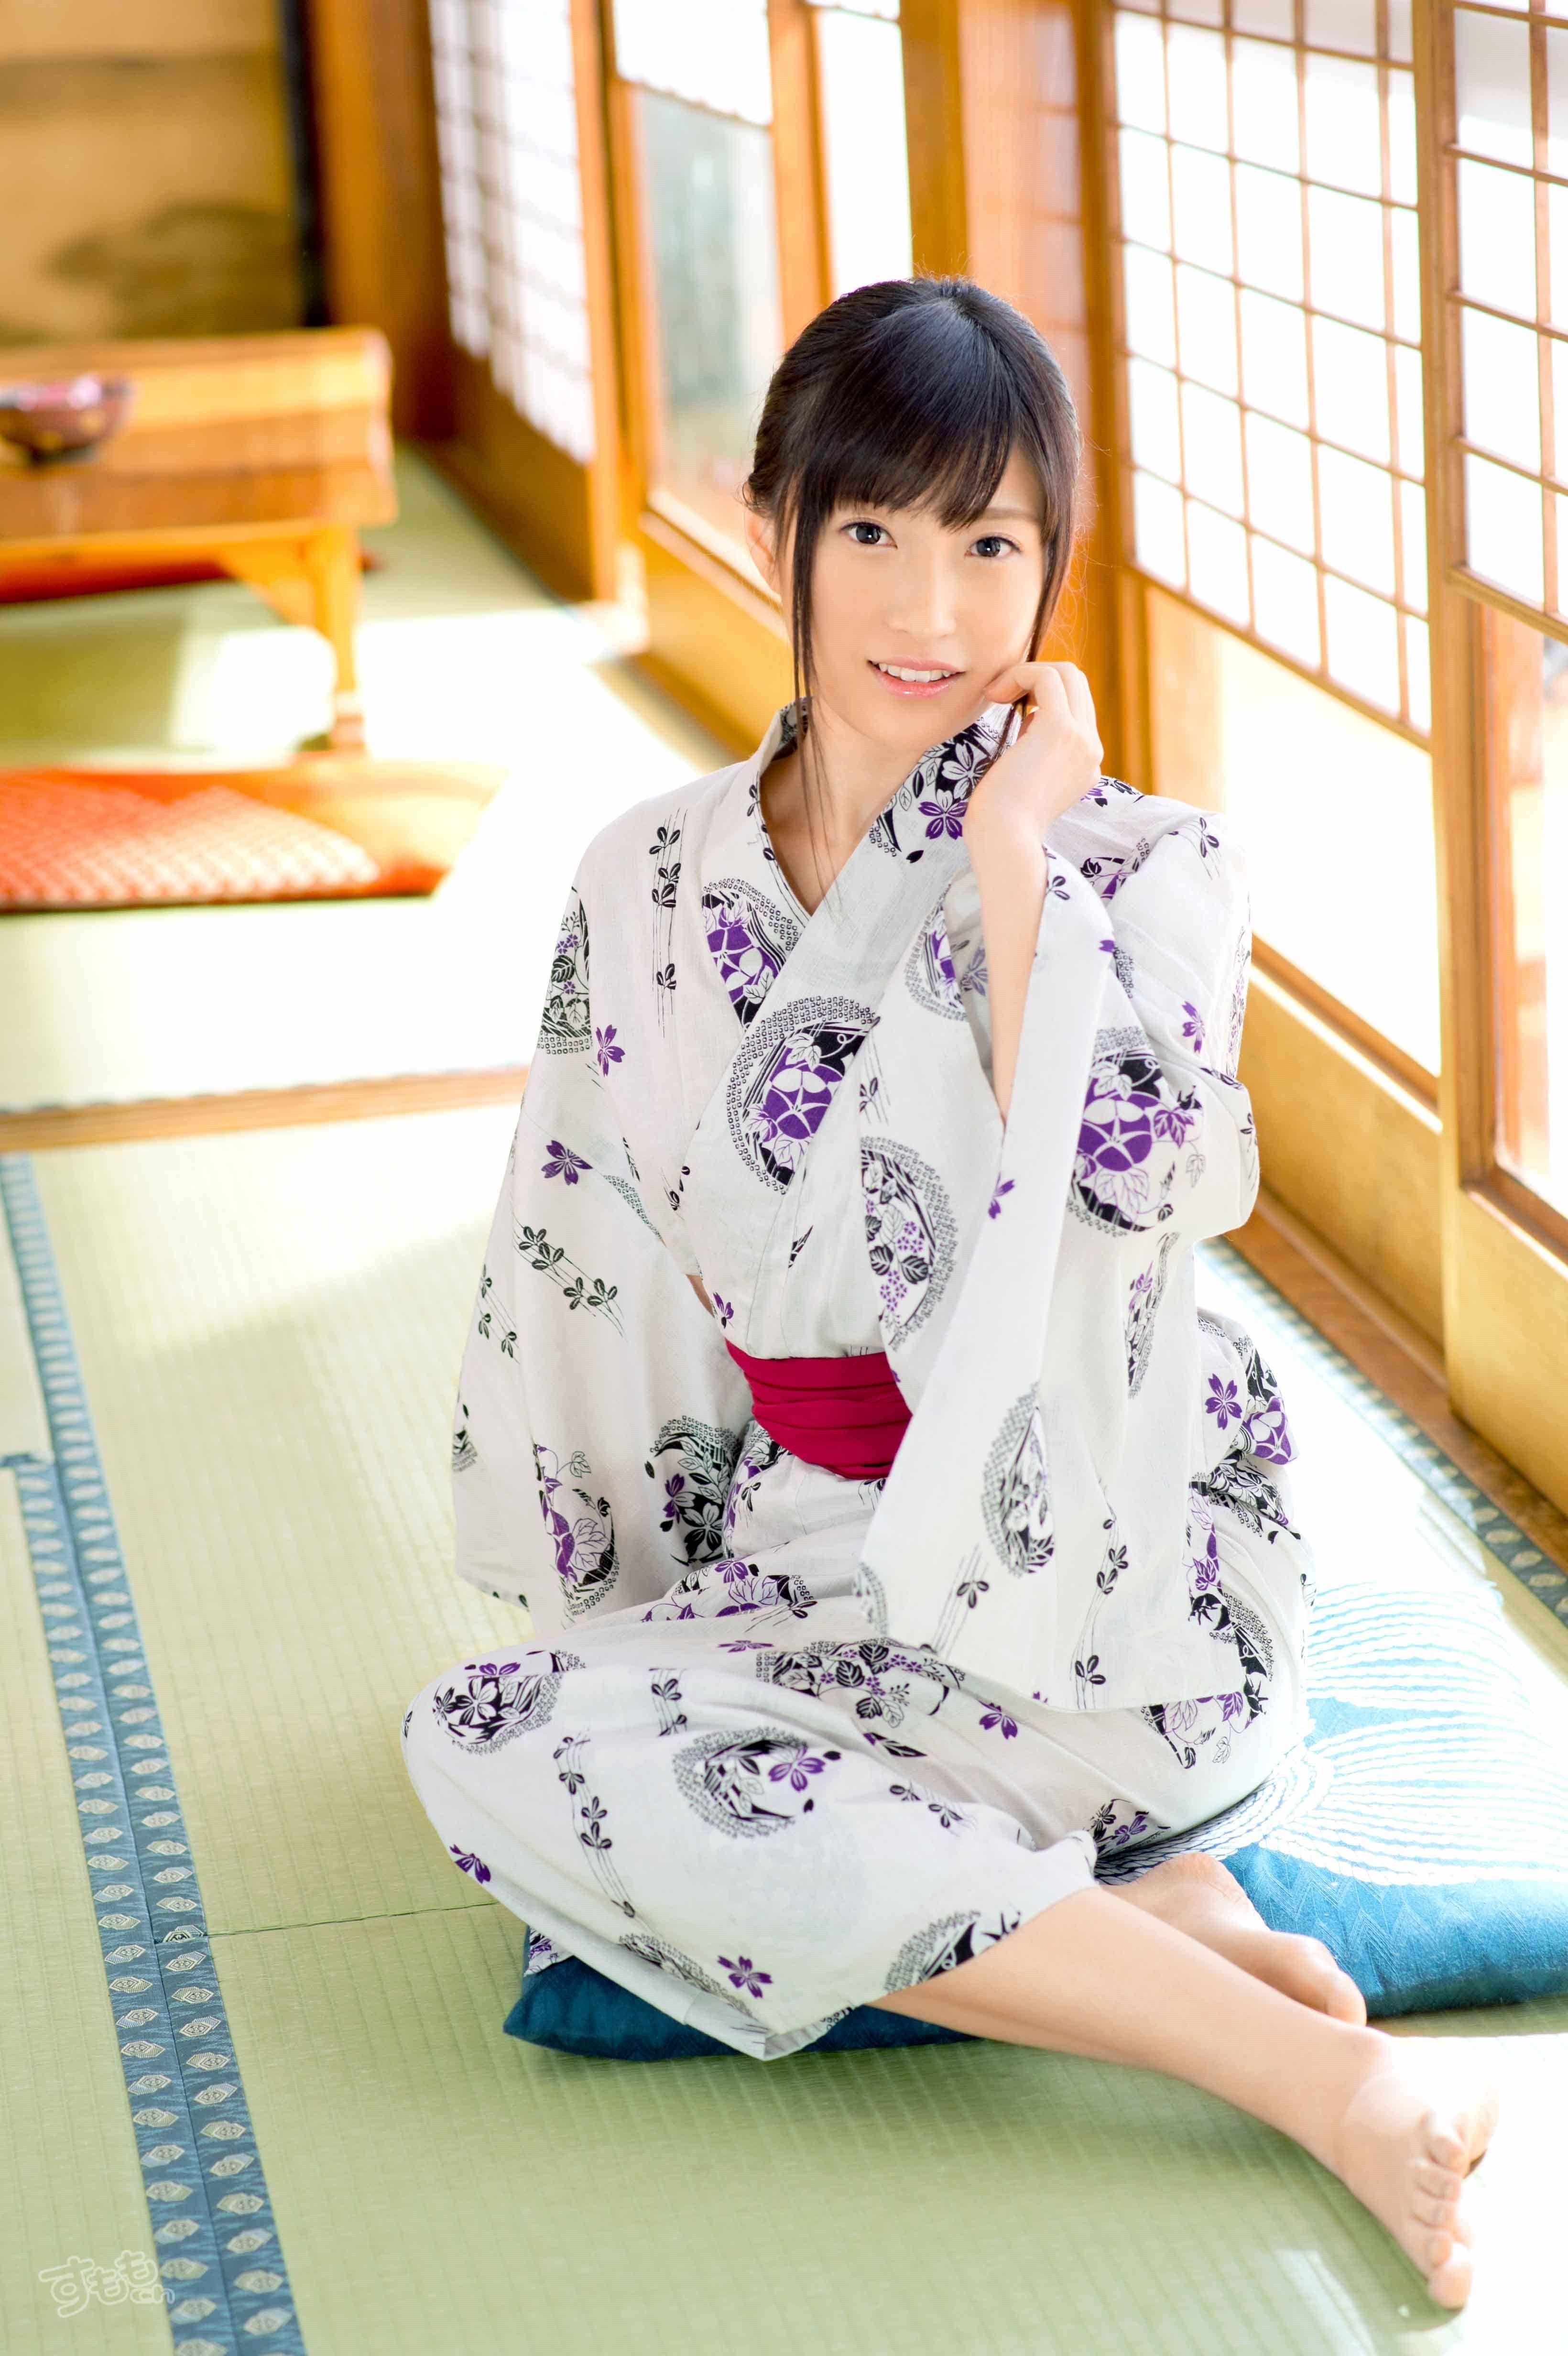 Kitano Nozomi 北野のぞみ それはすぐに私は行くべきである O O Upload: Nozomi Kitano